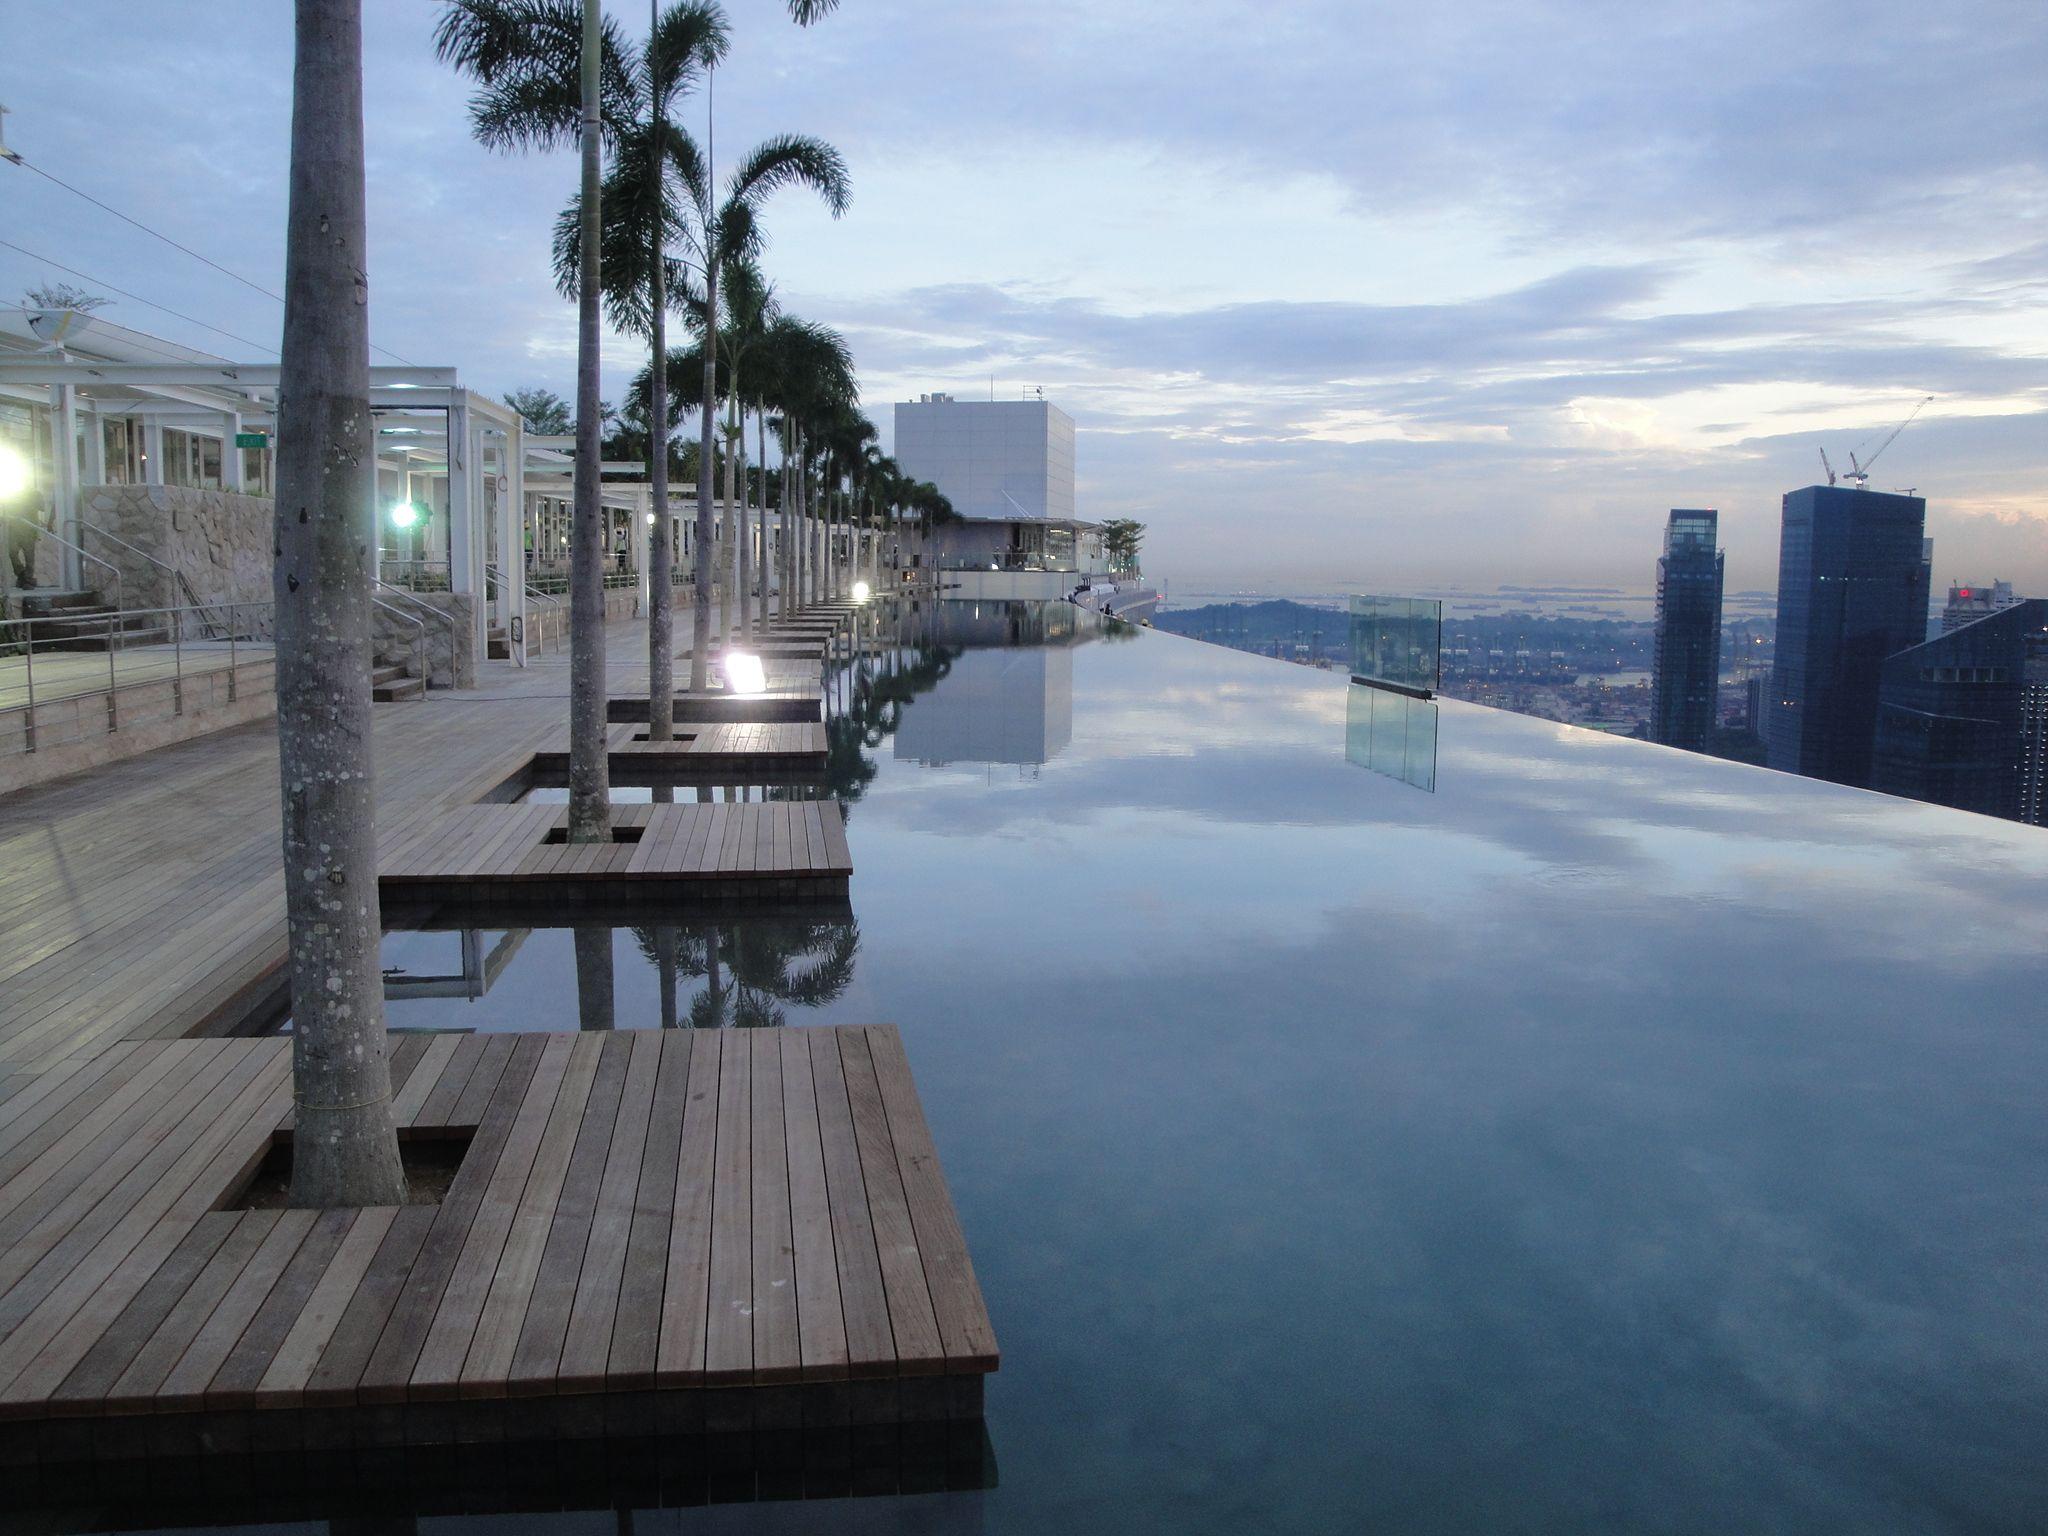 Marina Bay Sands Skypark Singapore Google